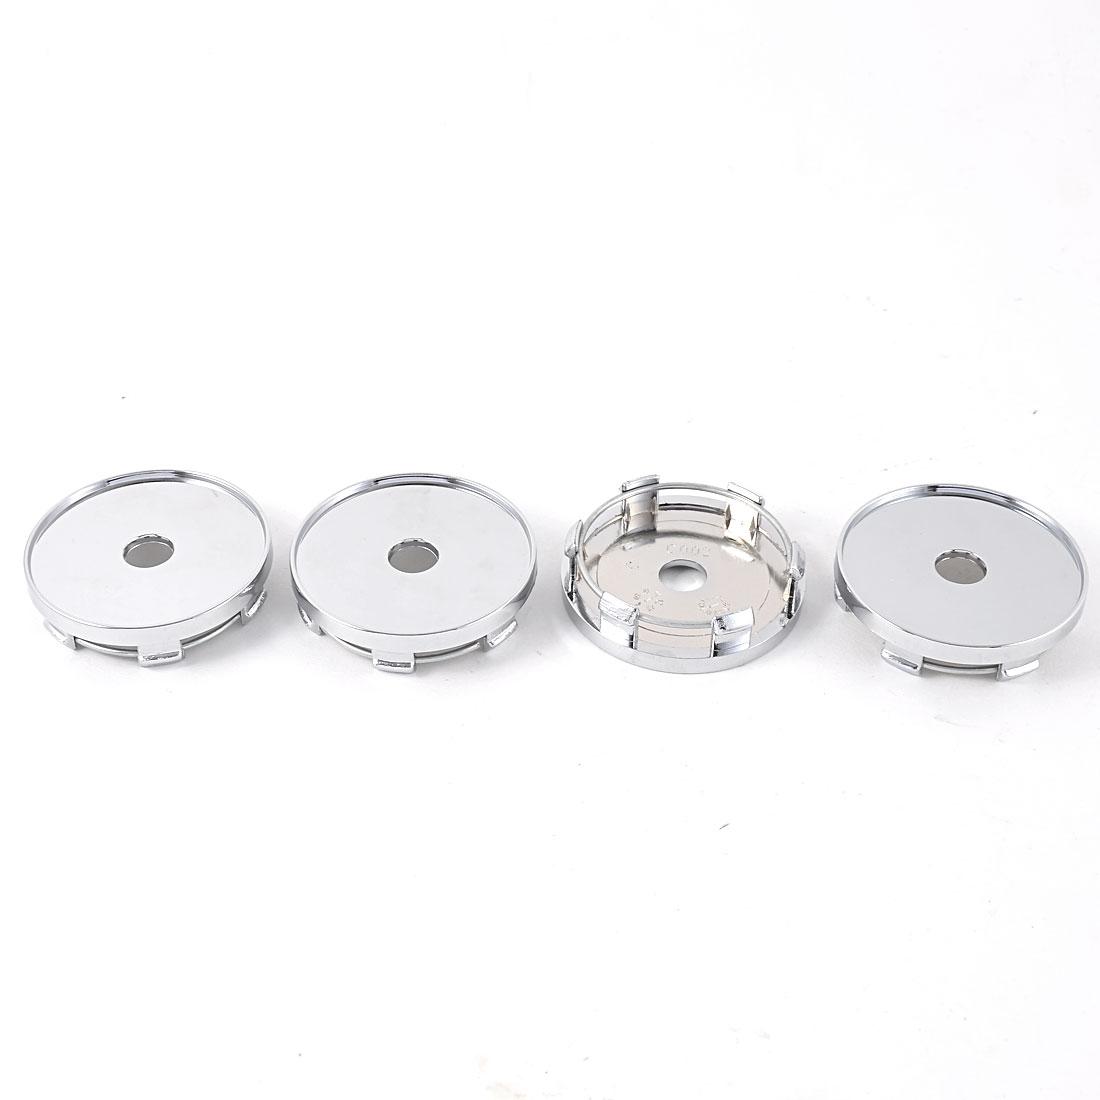 Universal Racing Car Automotive Wheel Center Hub Caps Covers 59mm Dia 4 Pcs